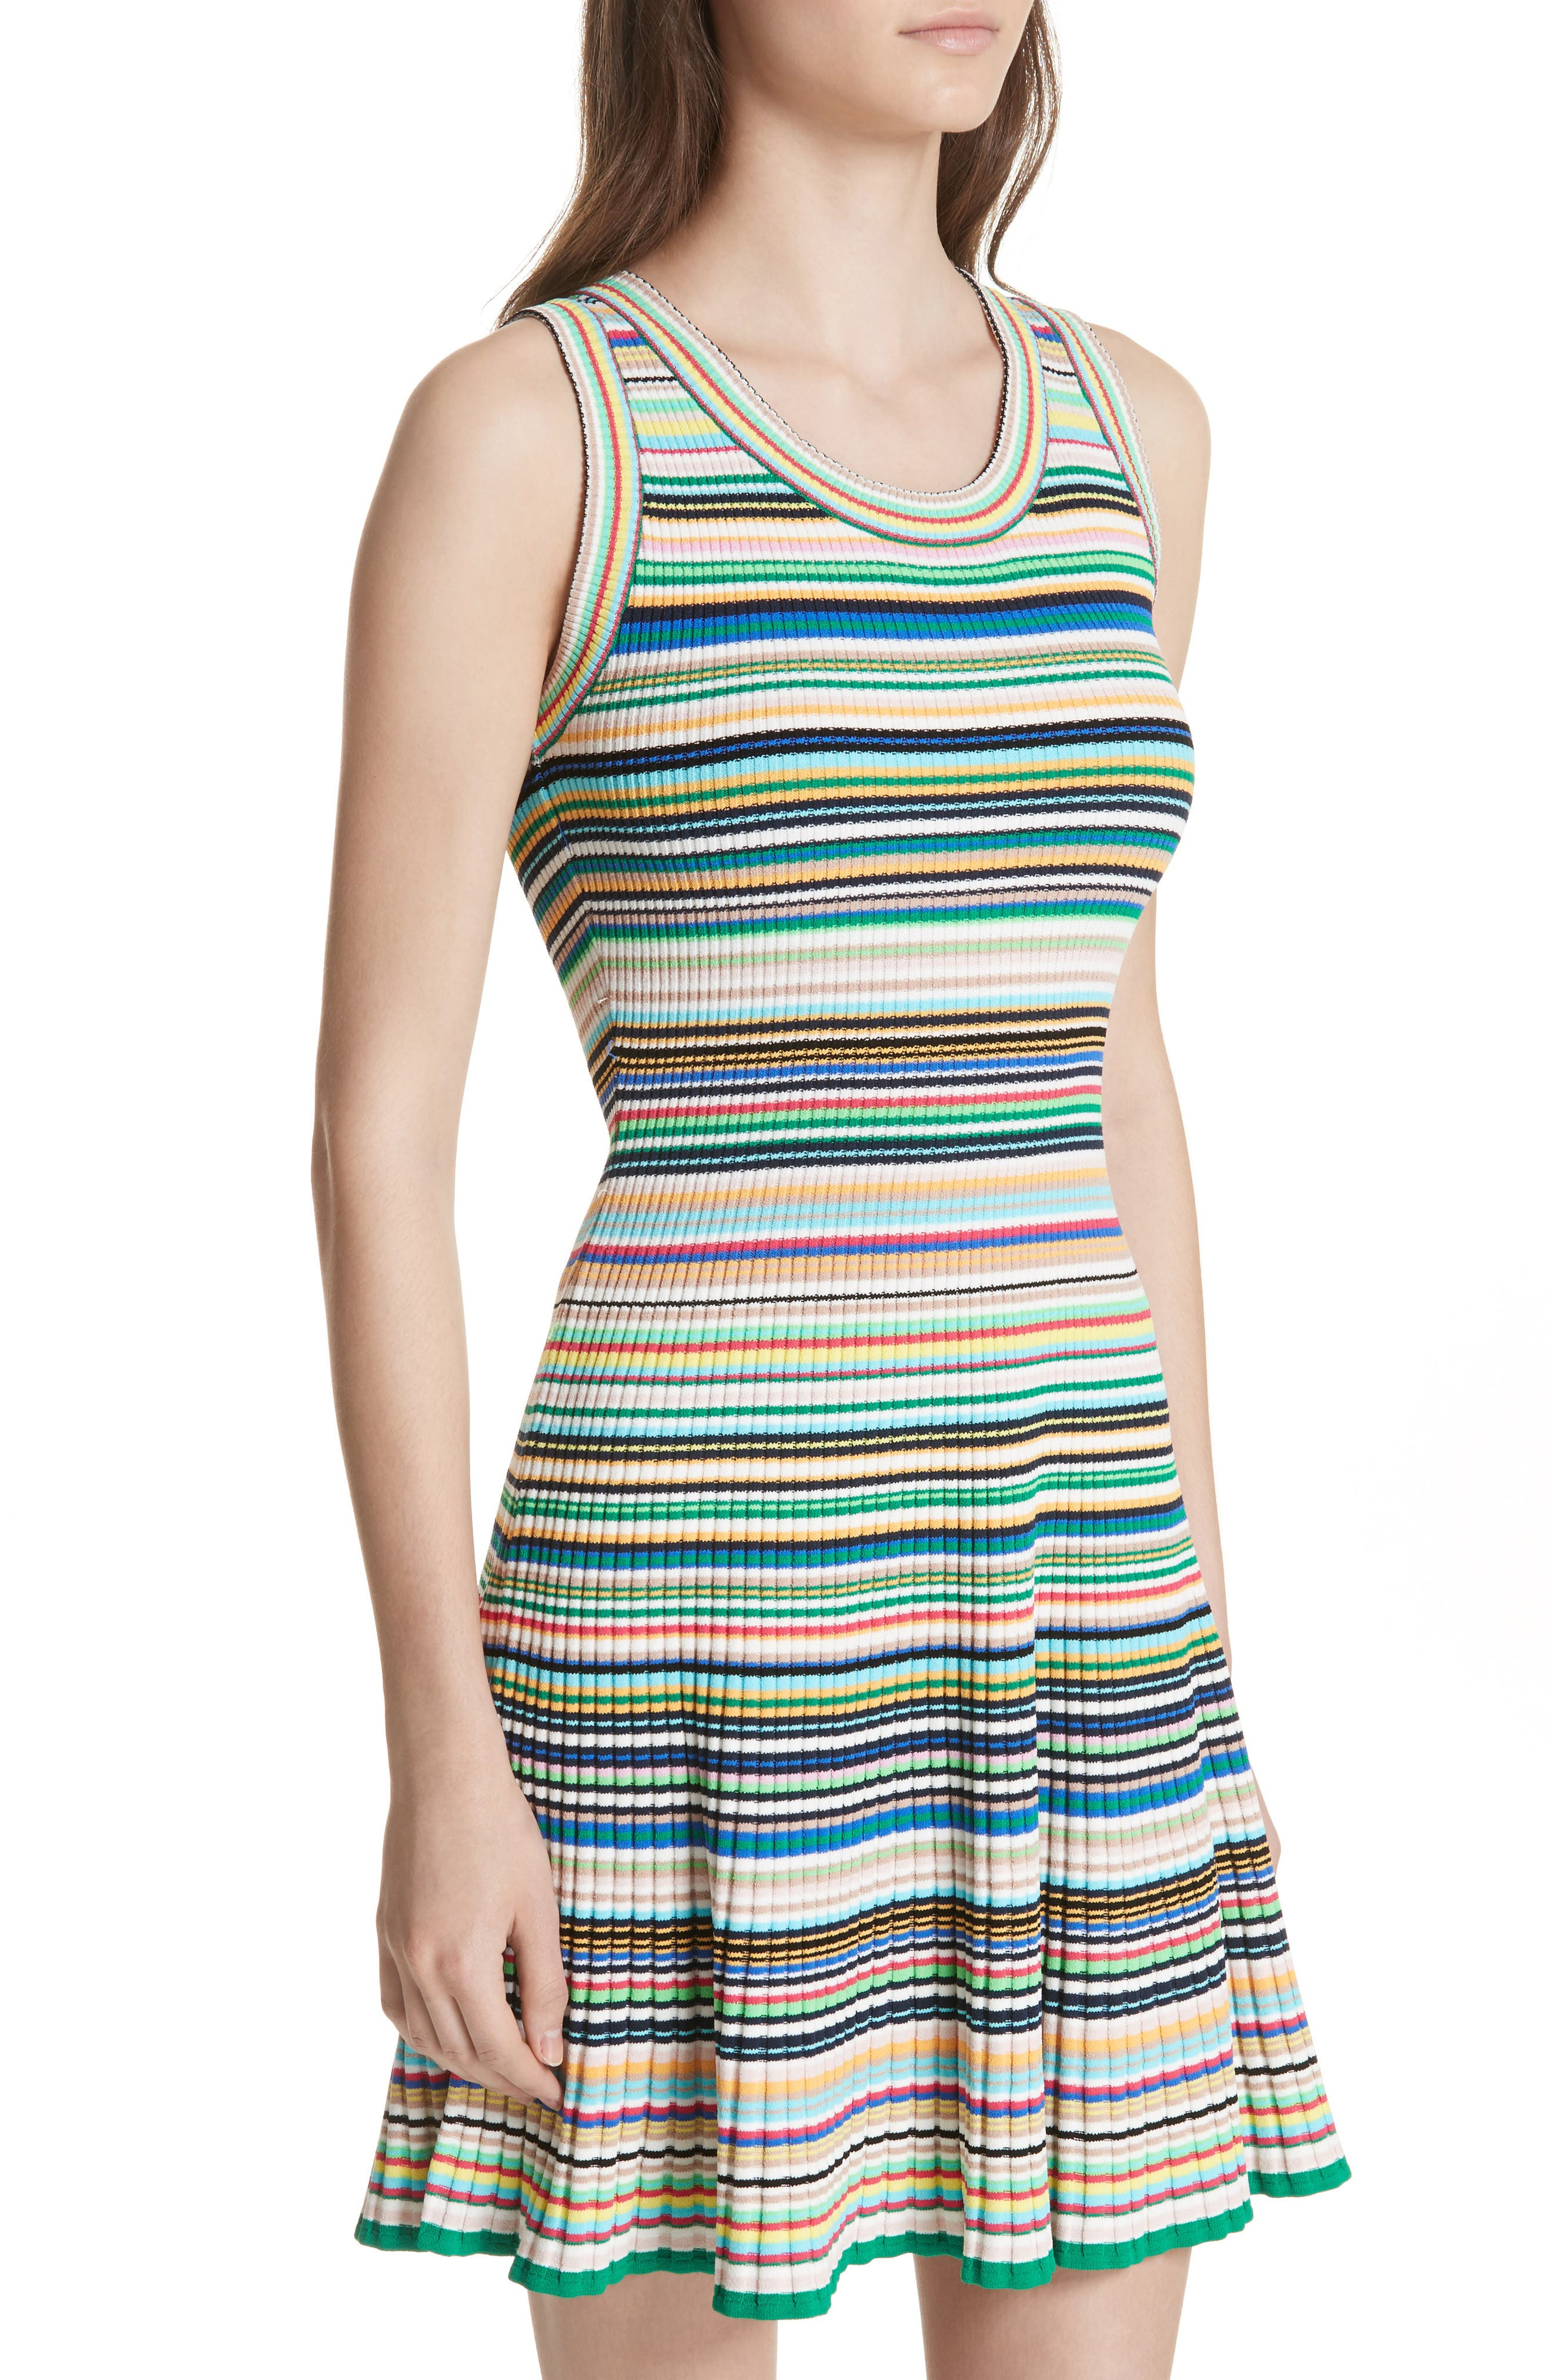 Microstripe Knit Fit & Flare Dress,                             Alternate thumbnail 4, color,                             Rainbow Multi